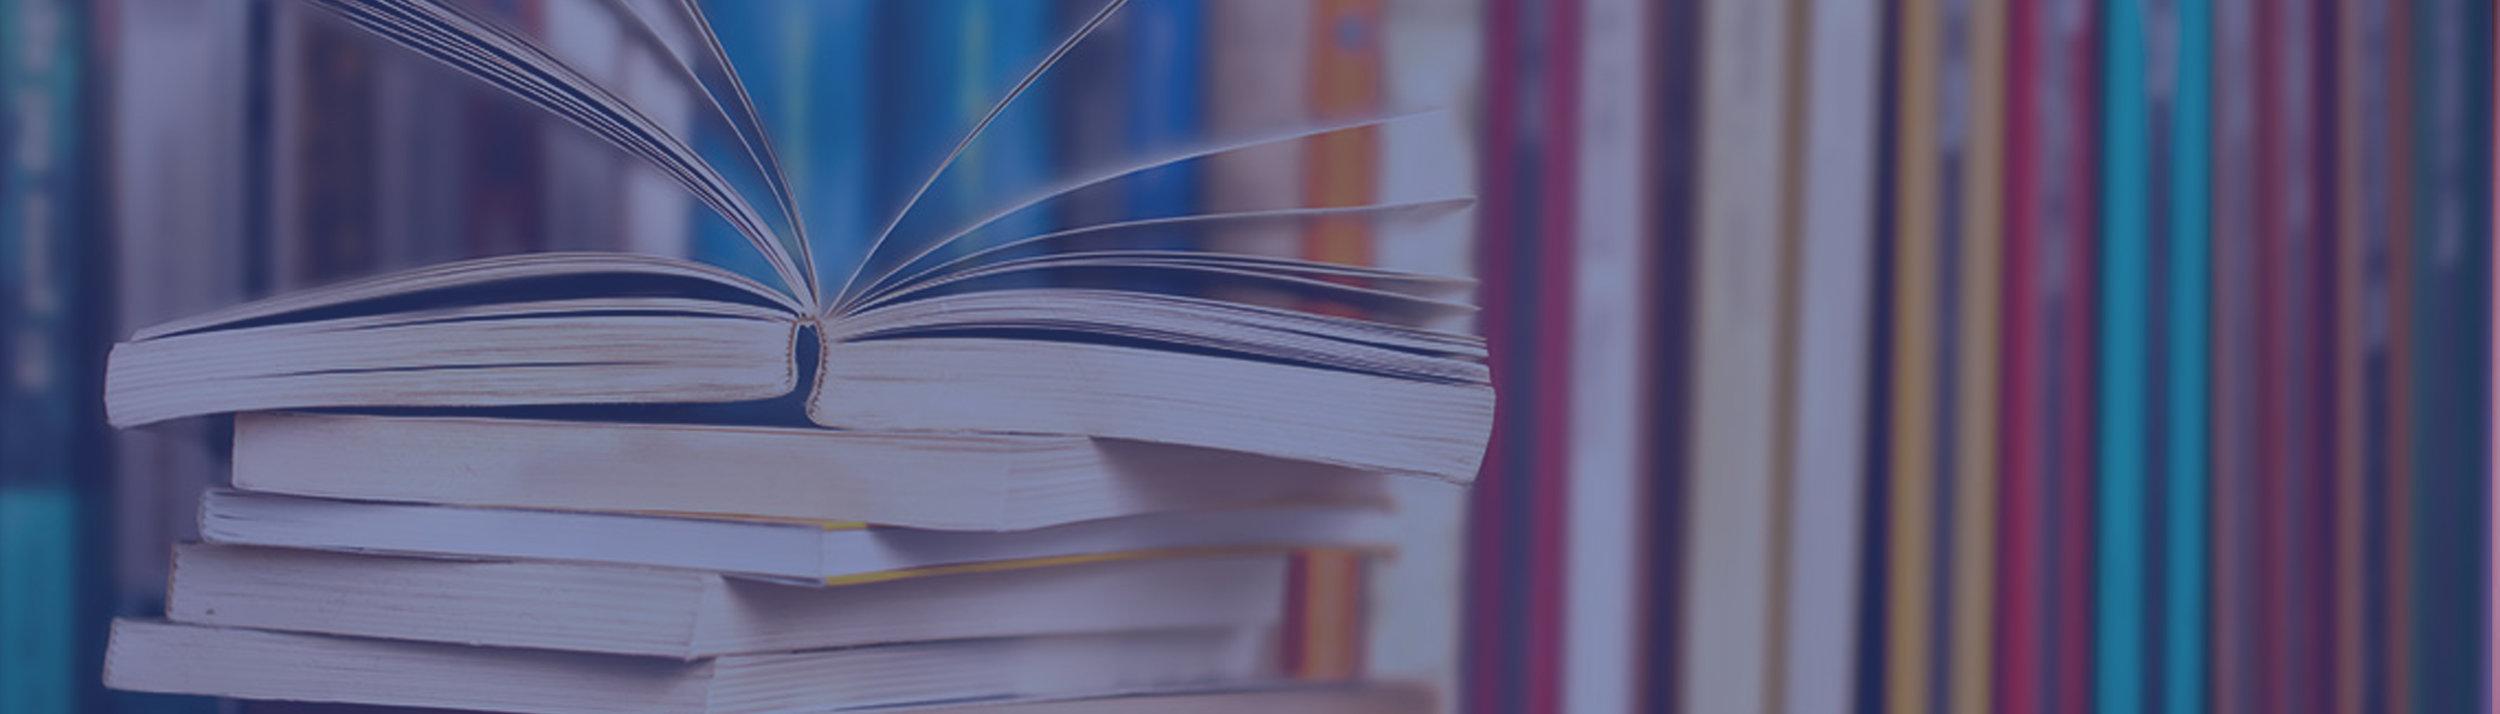 blue-books.jpg